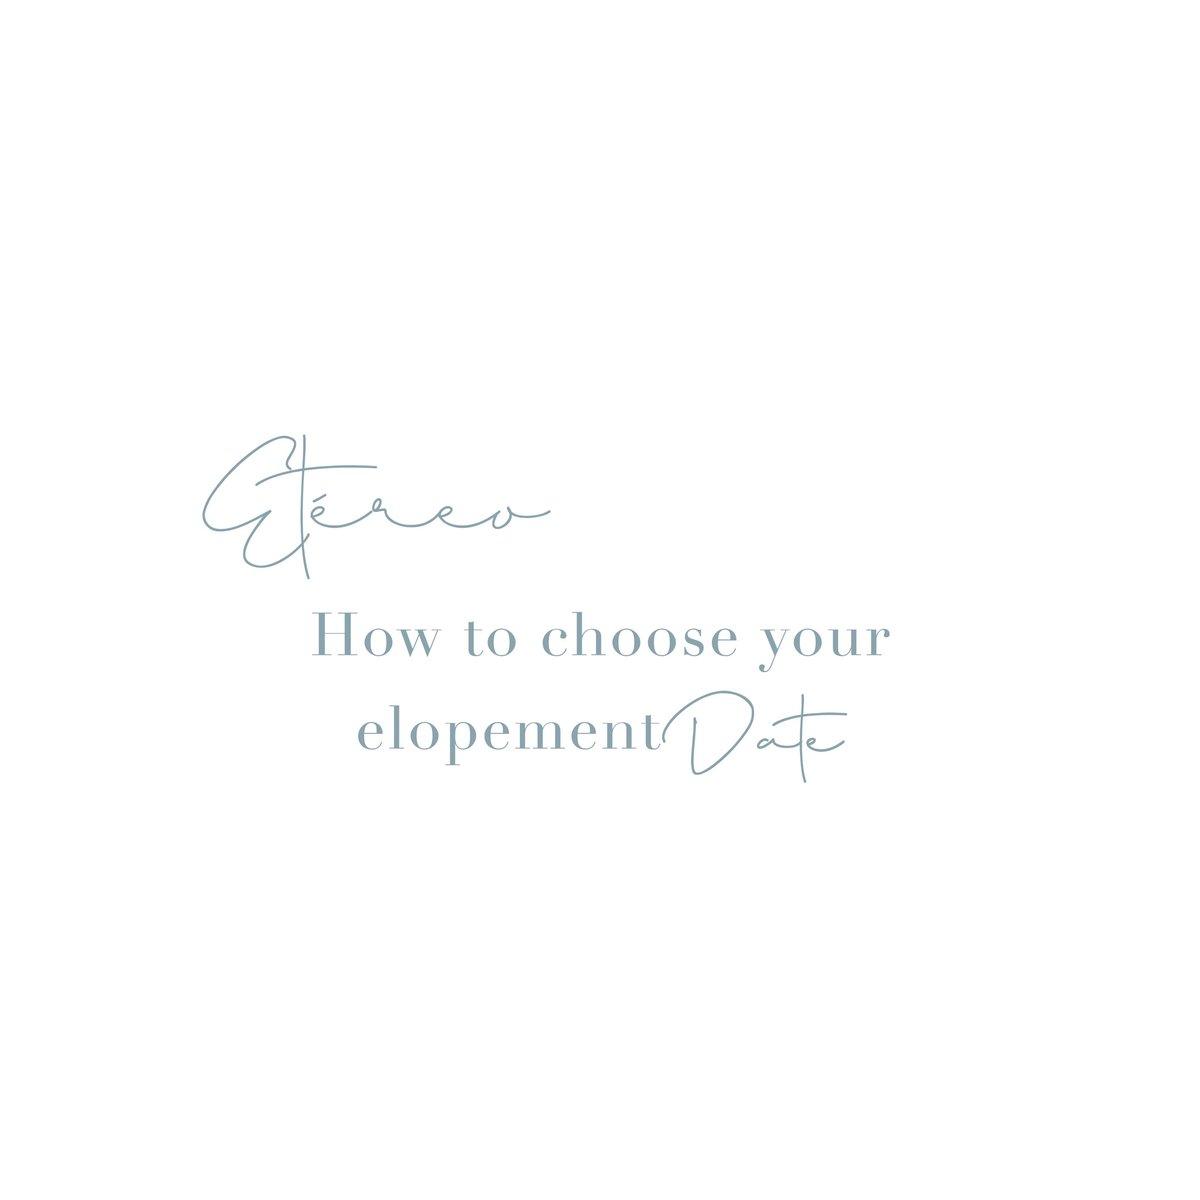 4 recommendations to choose your elopement date! .  #Elopement #Elopements #ElopementPlanner #ElopementWeddings #EtéreoElopements #ElopementsToday #WeddingsToday #WeddingDetails #TieTheKnot #IntimateWedding #Wedding #WeddingDay #SpecialDaypic.twitter.com/GugiqqfnKr